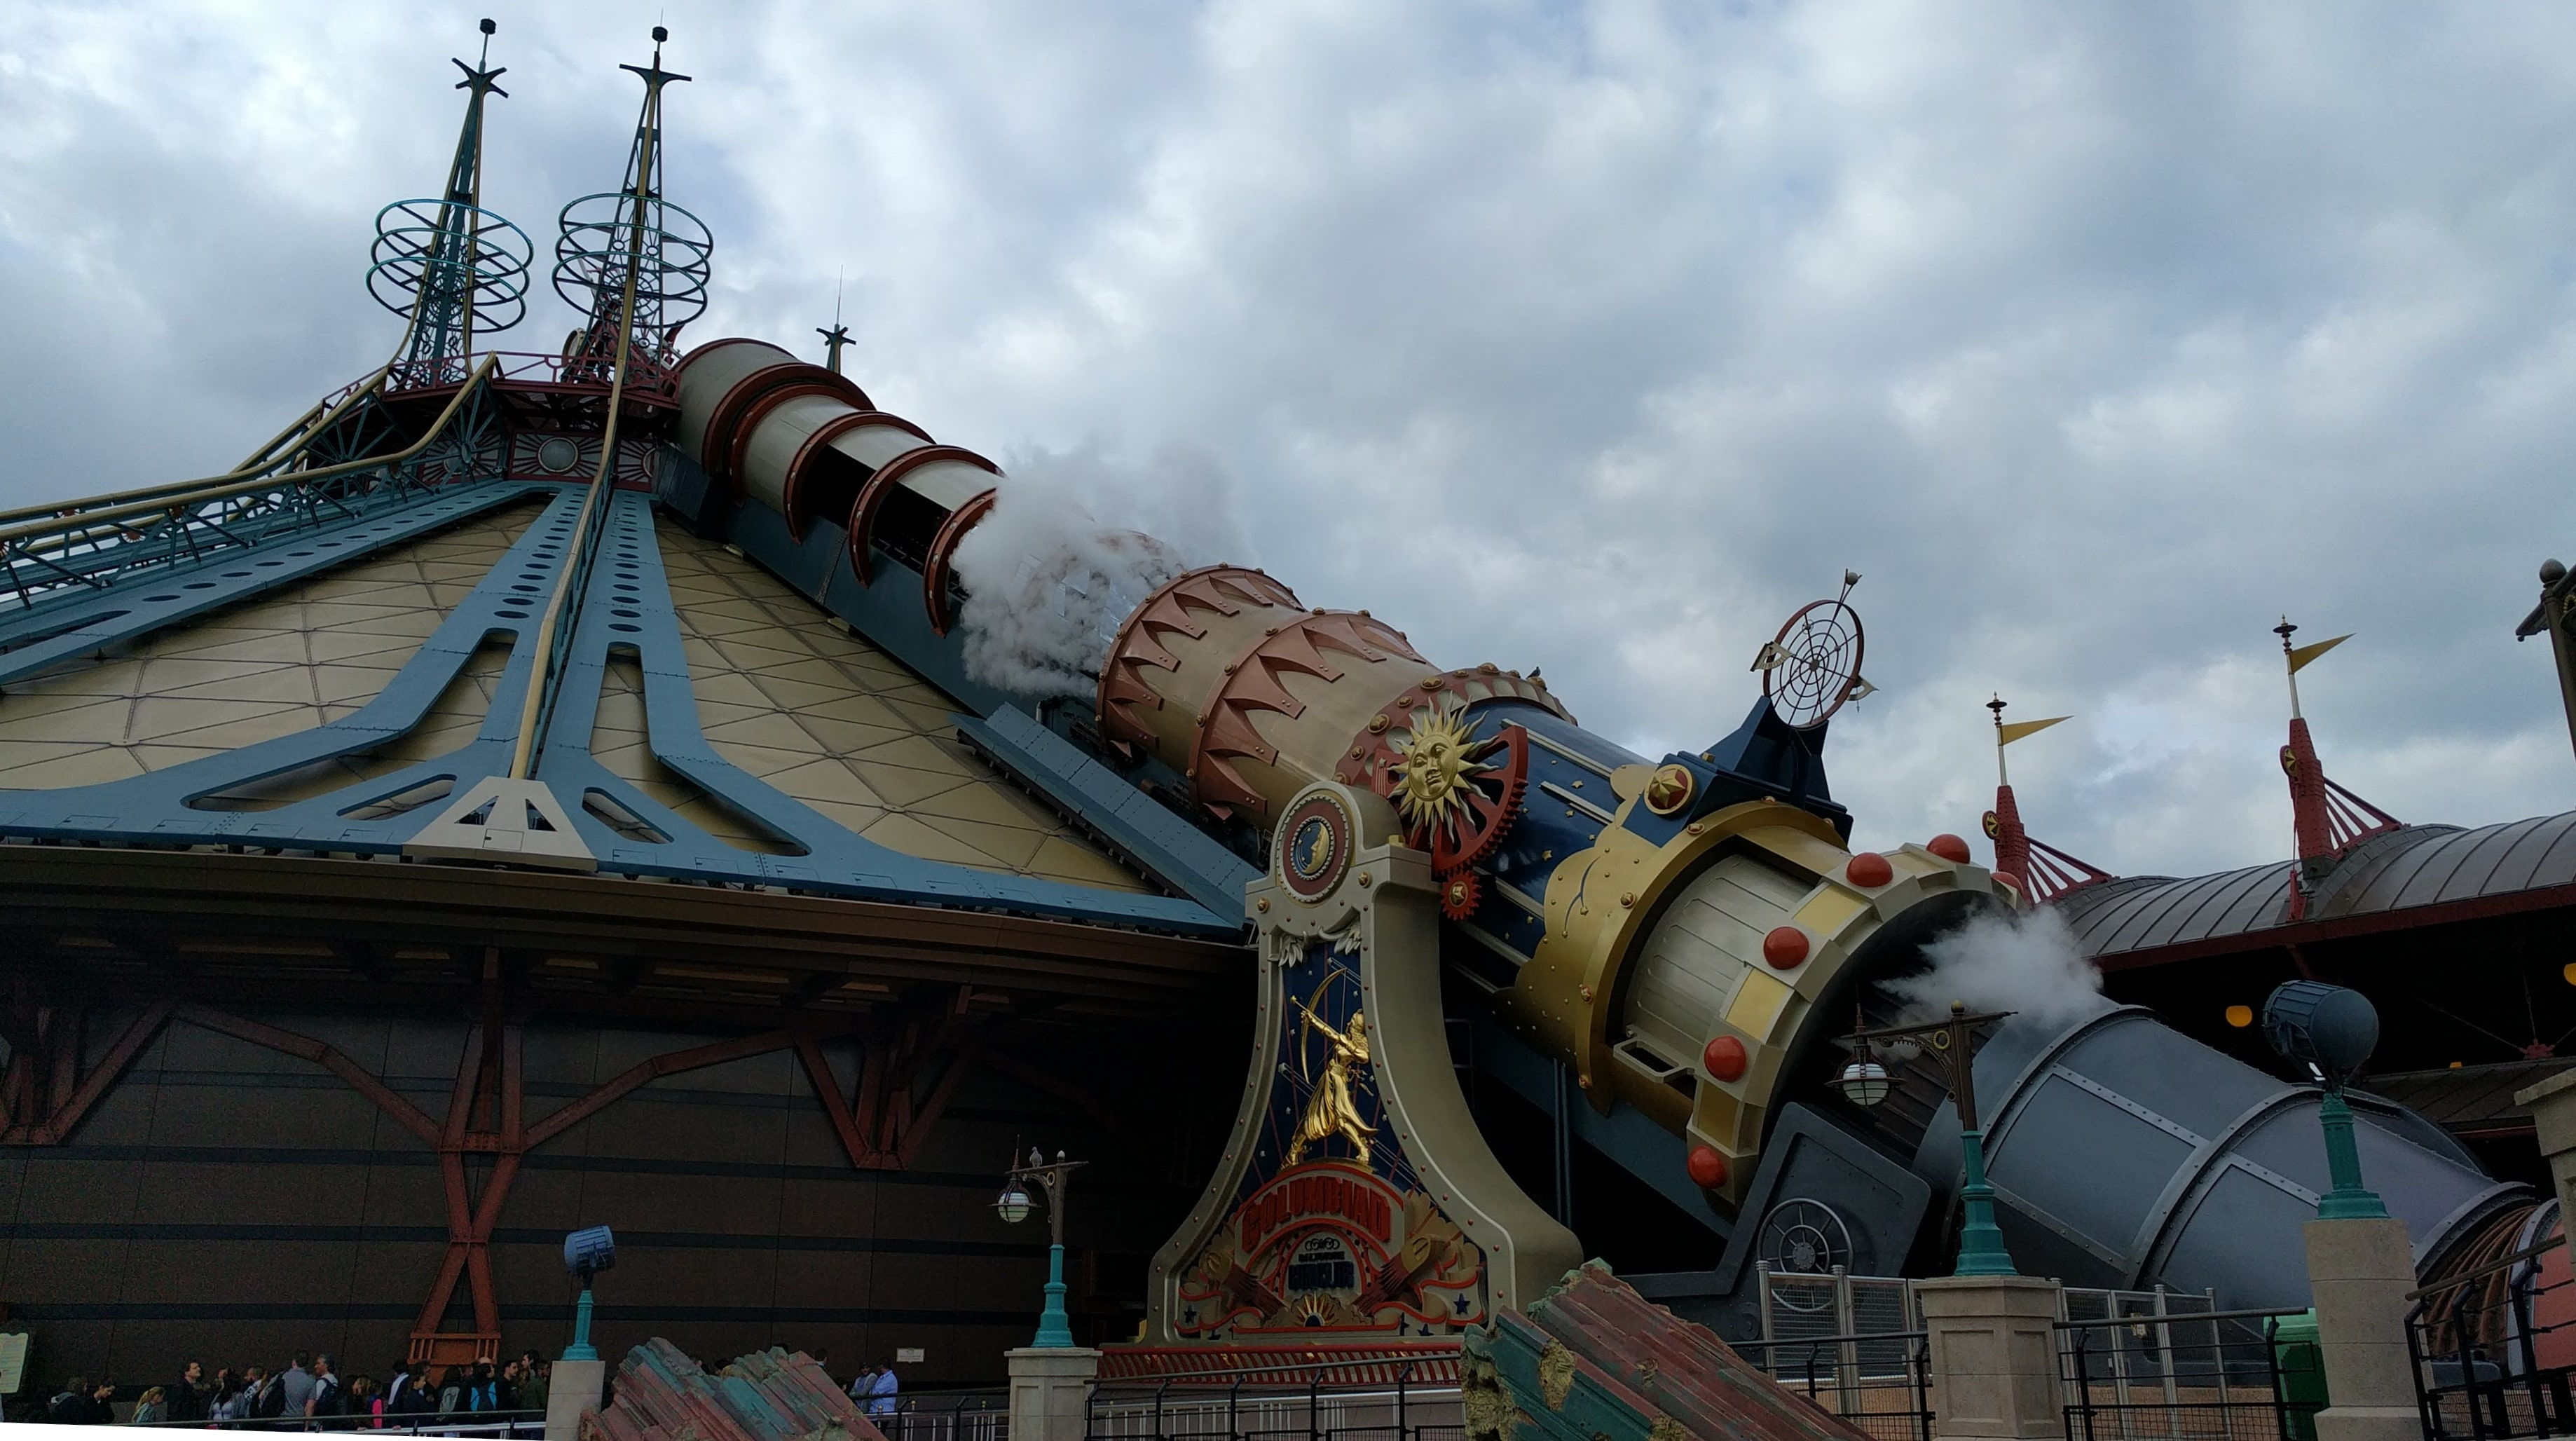 Disneyland Paris Space Mountain